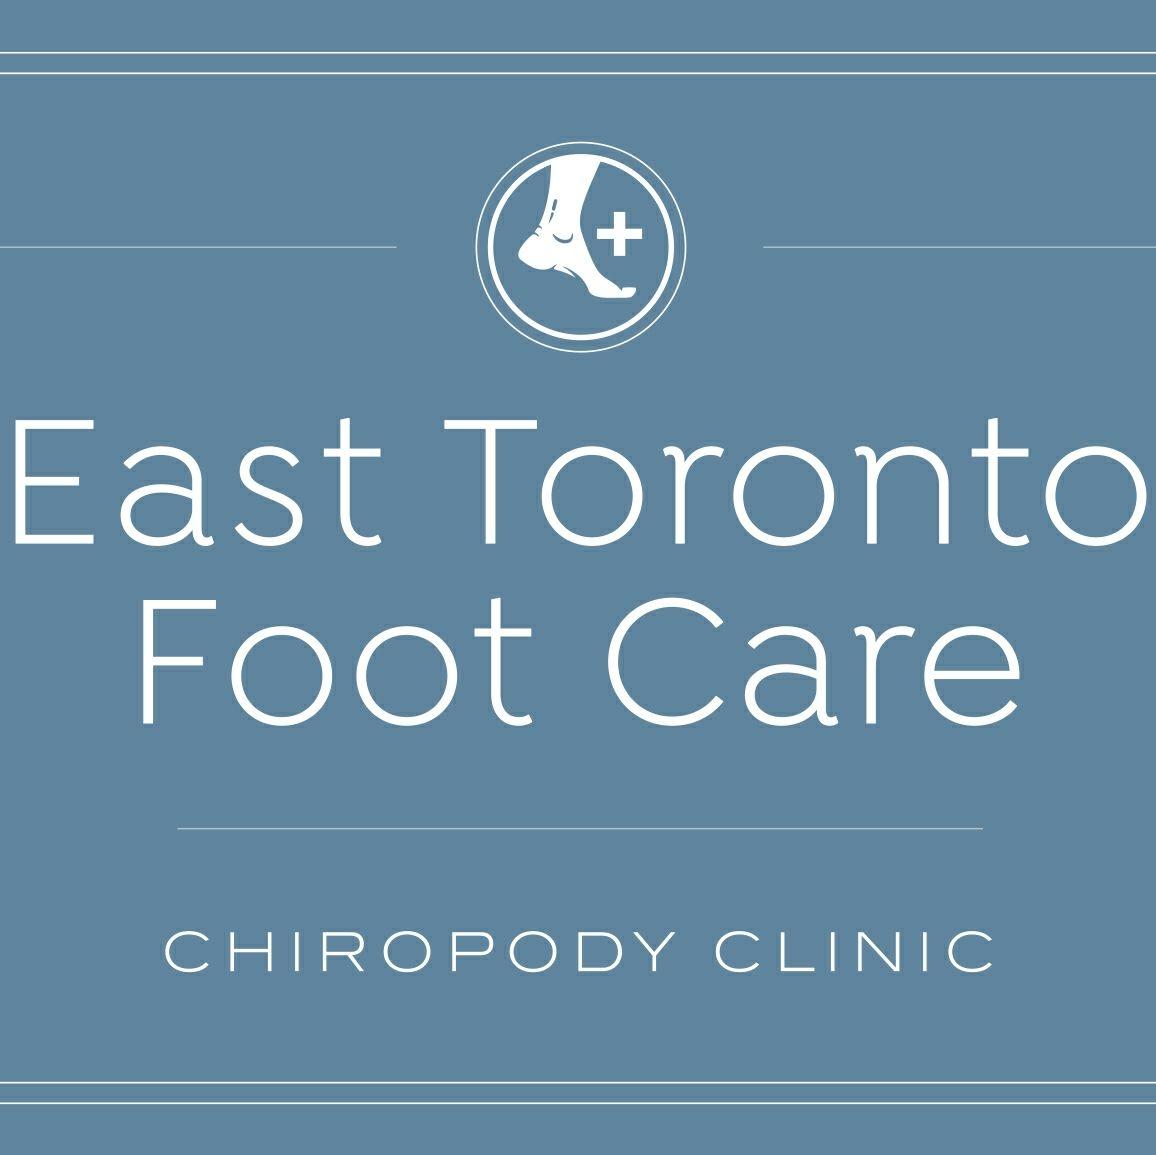 East Toronto Footcare